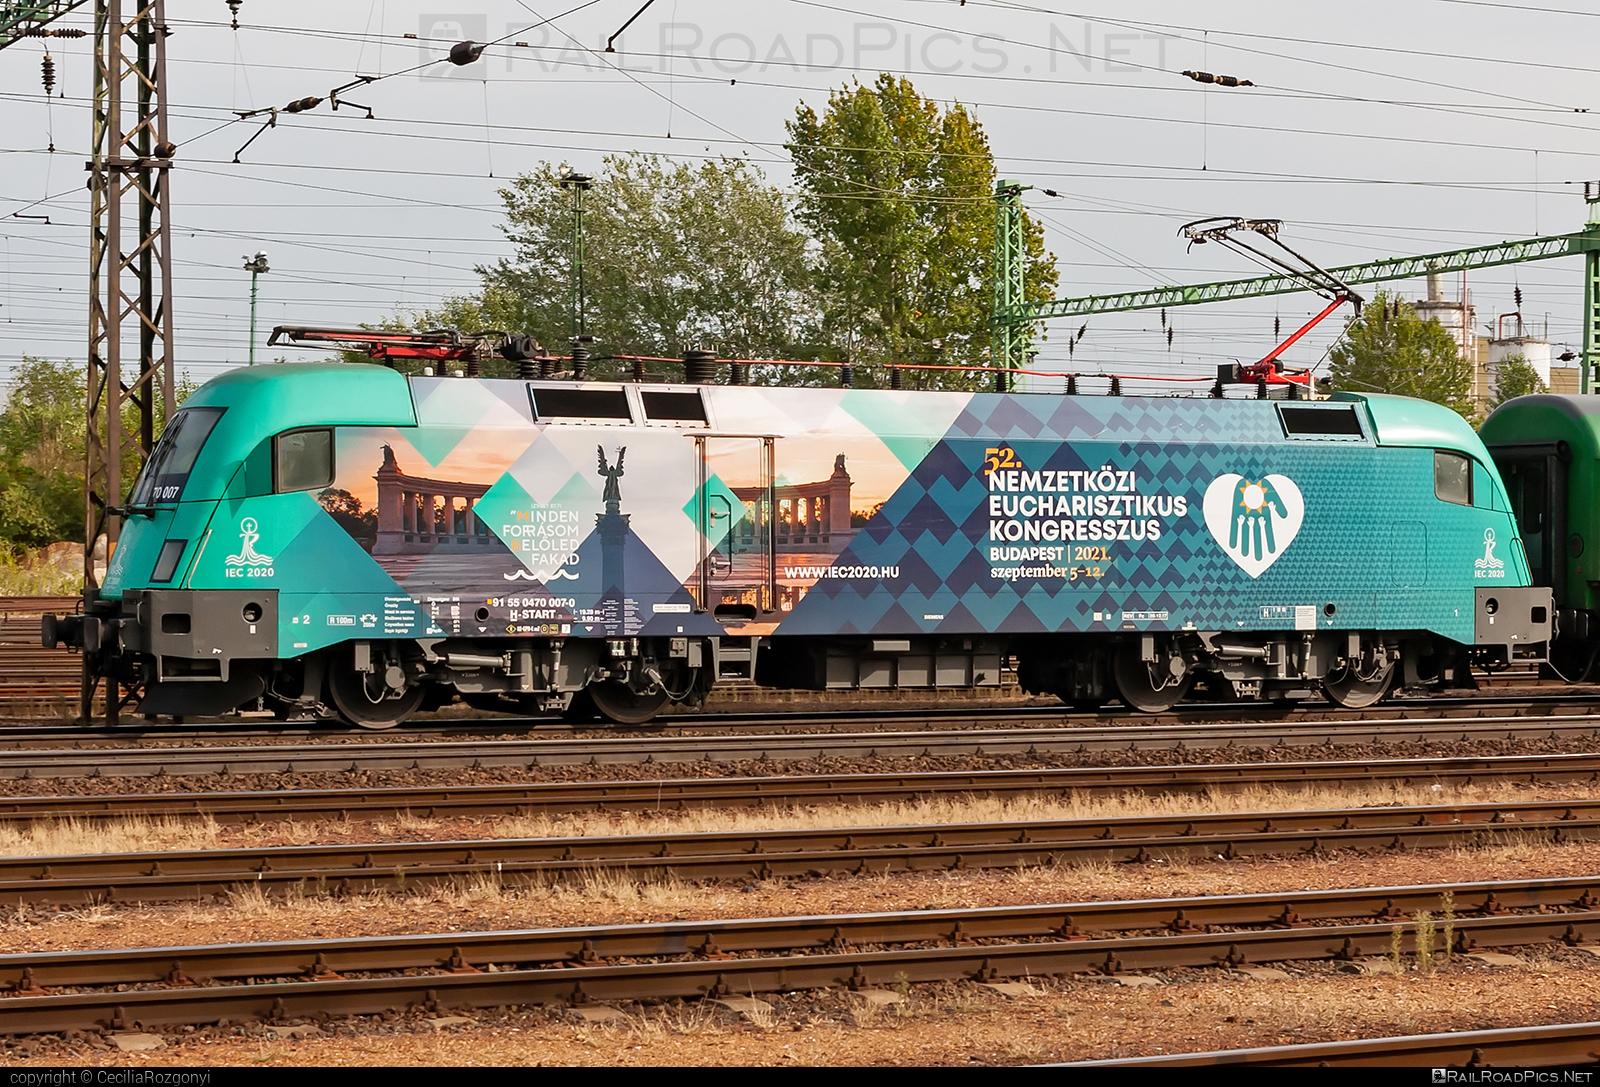 Siemens ES 64 U2 - 470 007 operated by MÁV-START ZRt. #es64 #es64u #es64u2 #eurosprinter #mav #mavstart #mavstartzrt #siemens #siemenses64 #siemenses64u #siemenses64u2 #siemenstaurus #taurus #tauruslocomotive